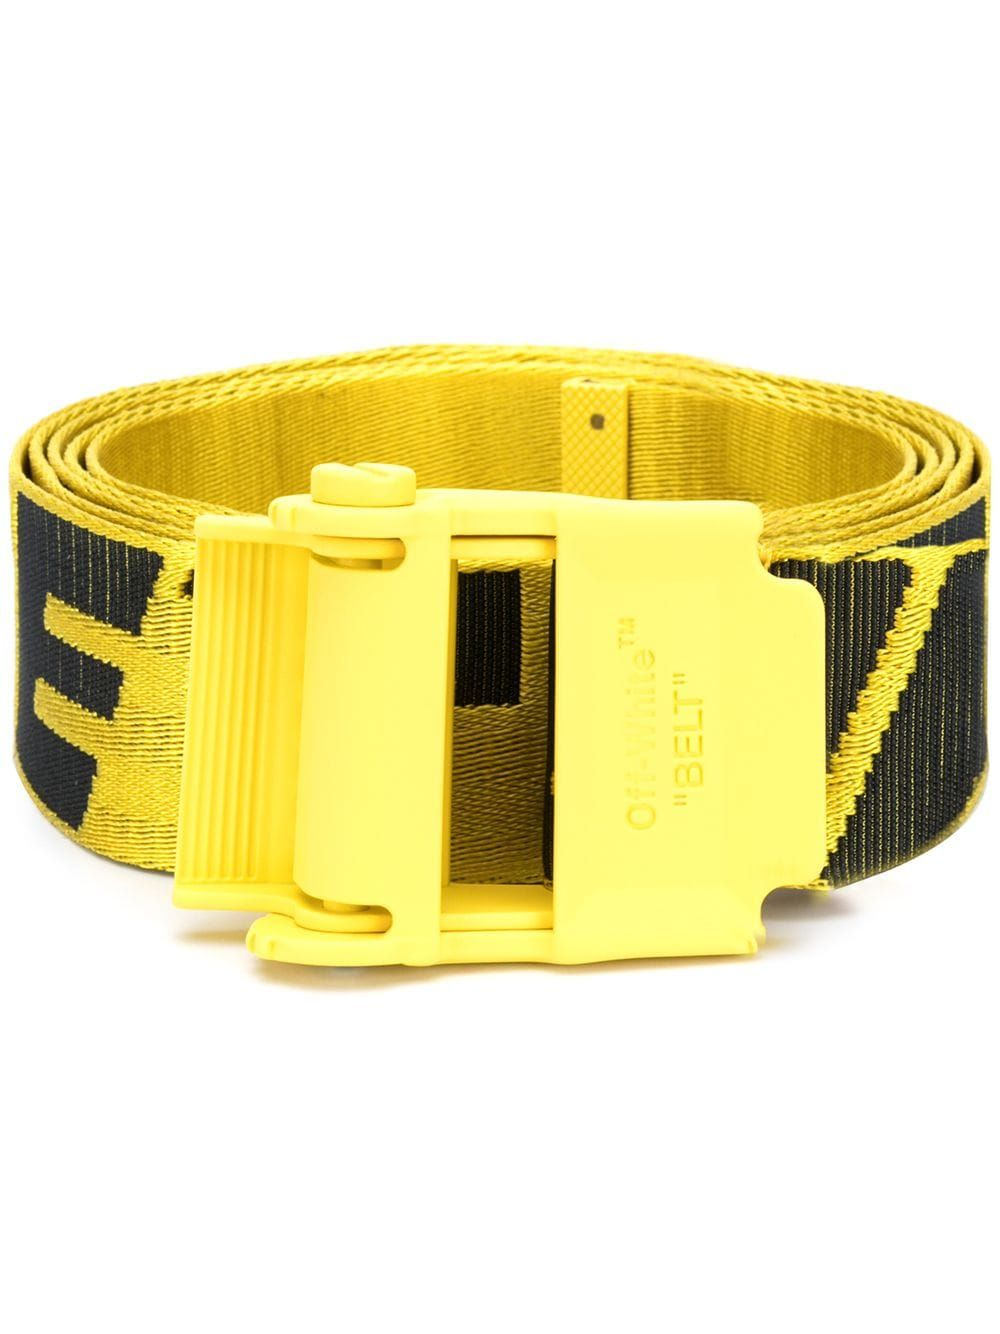 Cintura industrial 2.0